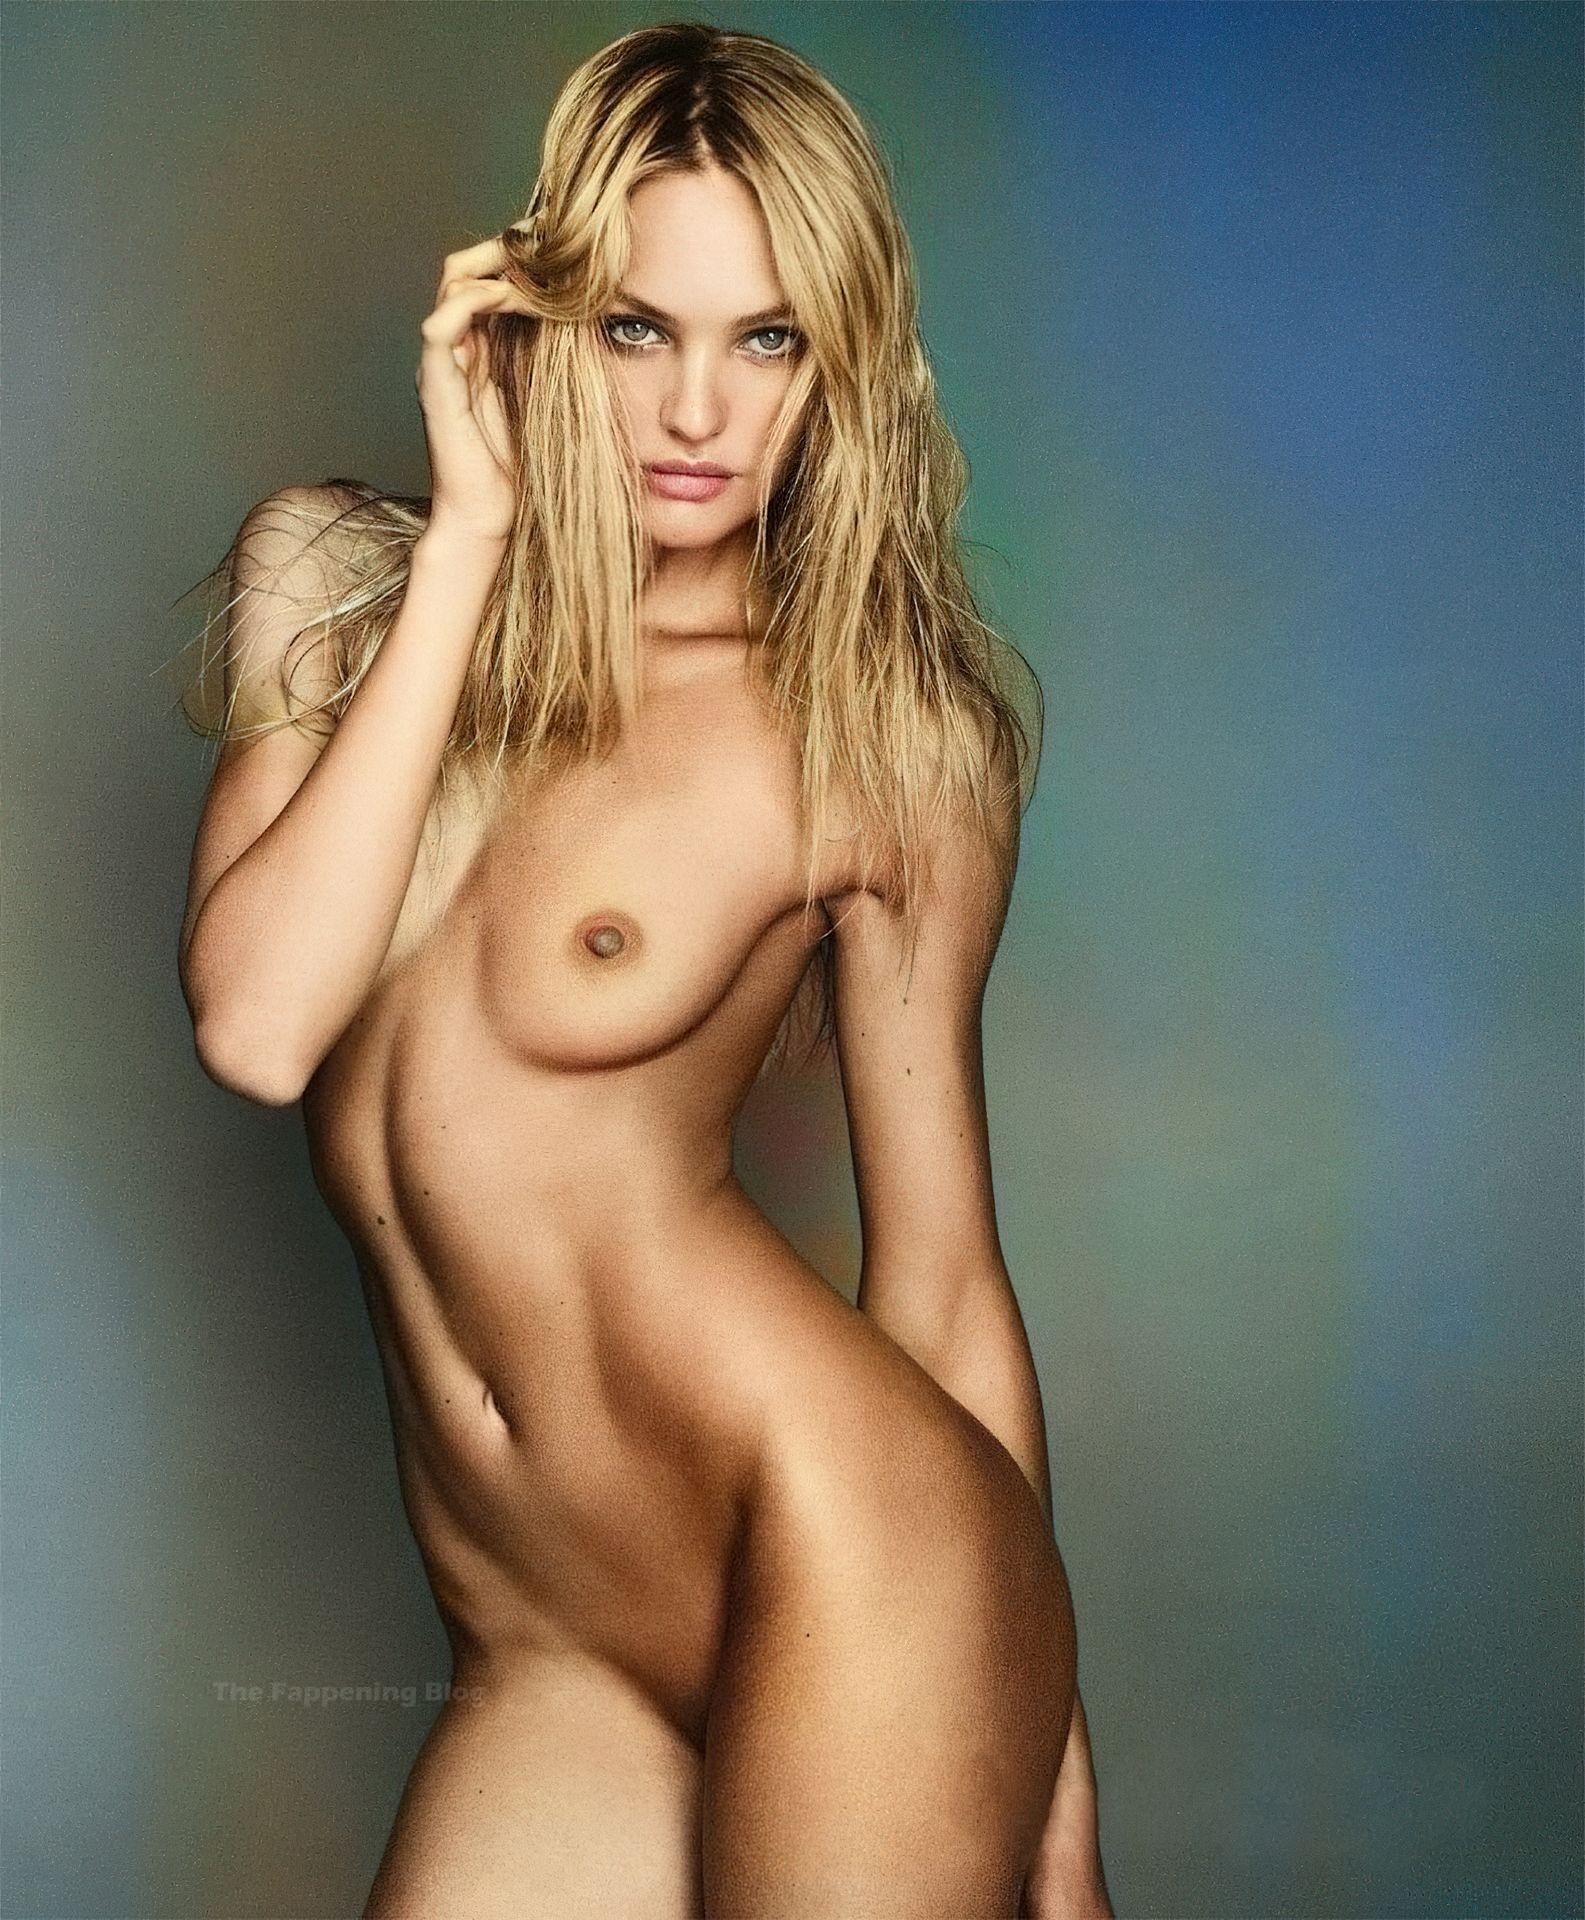 Candice Swanepoel Nude 0002